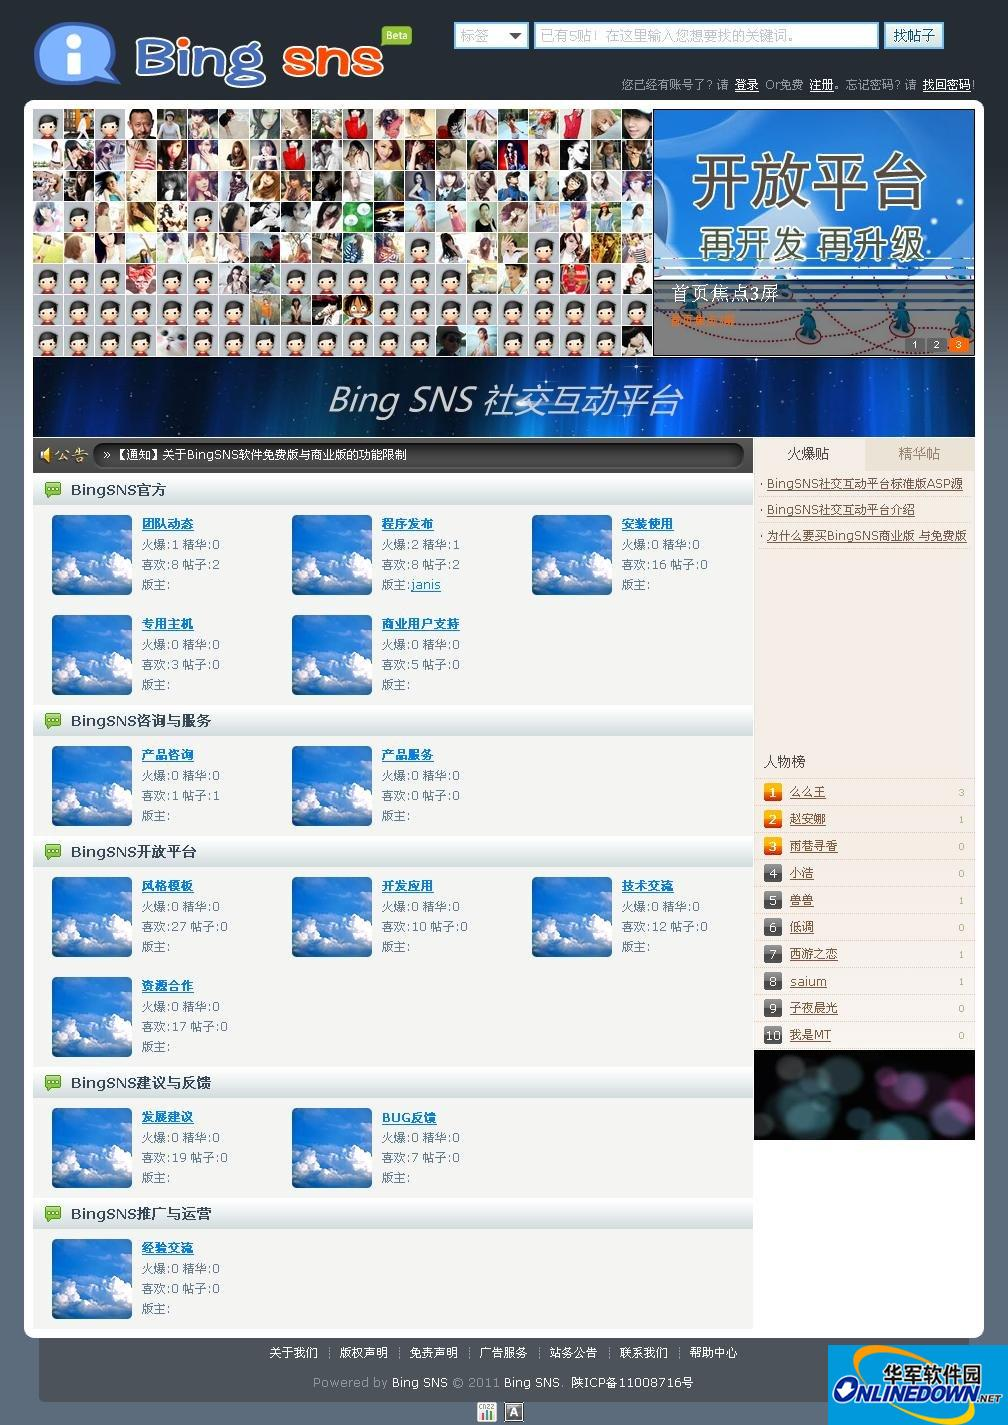 BingSNS社交互动平台  2.6 微博控